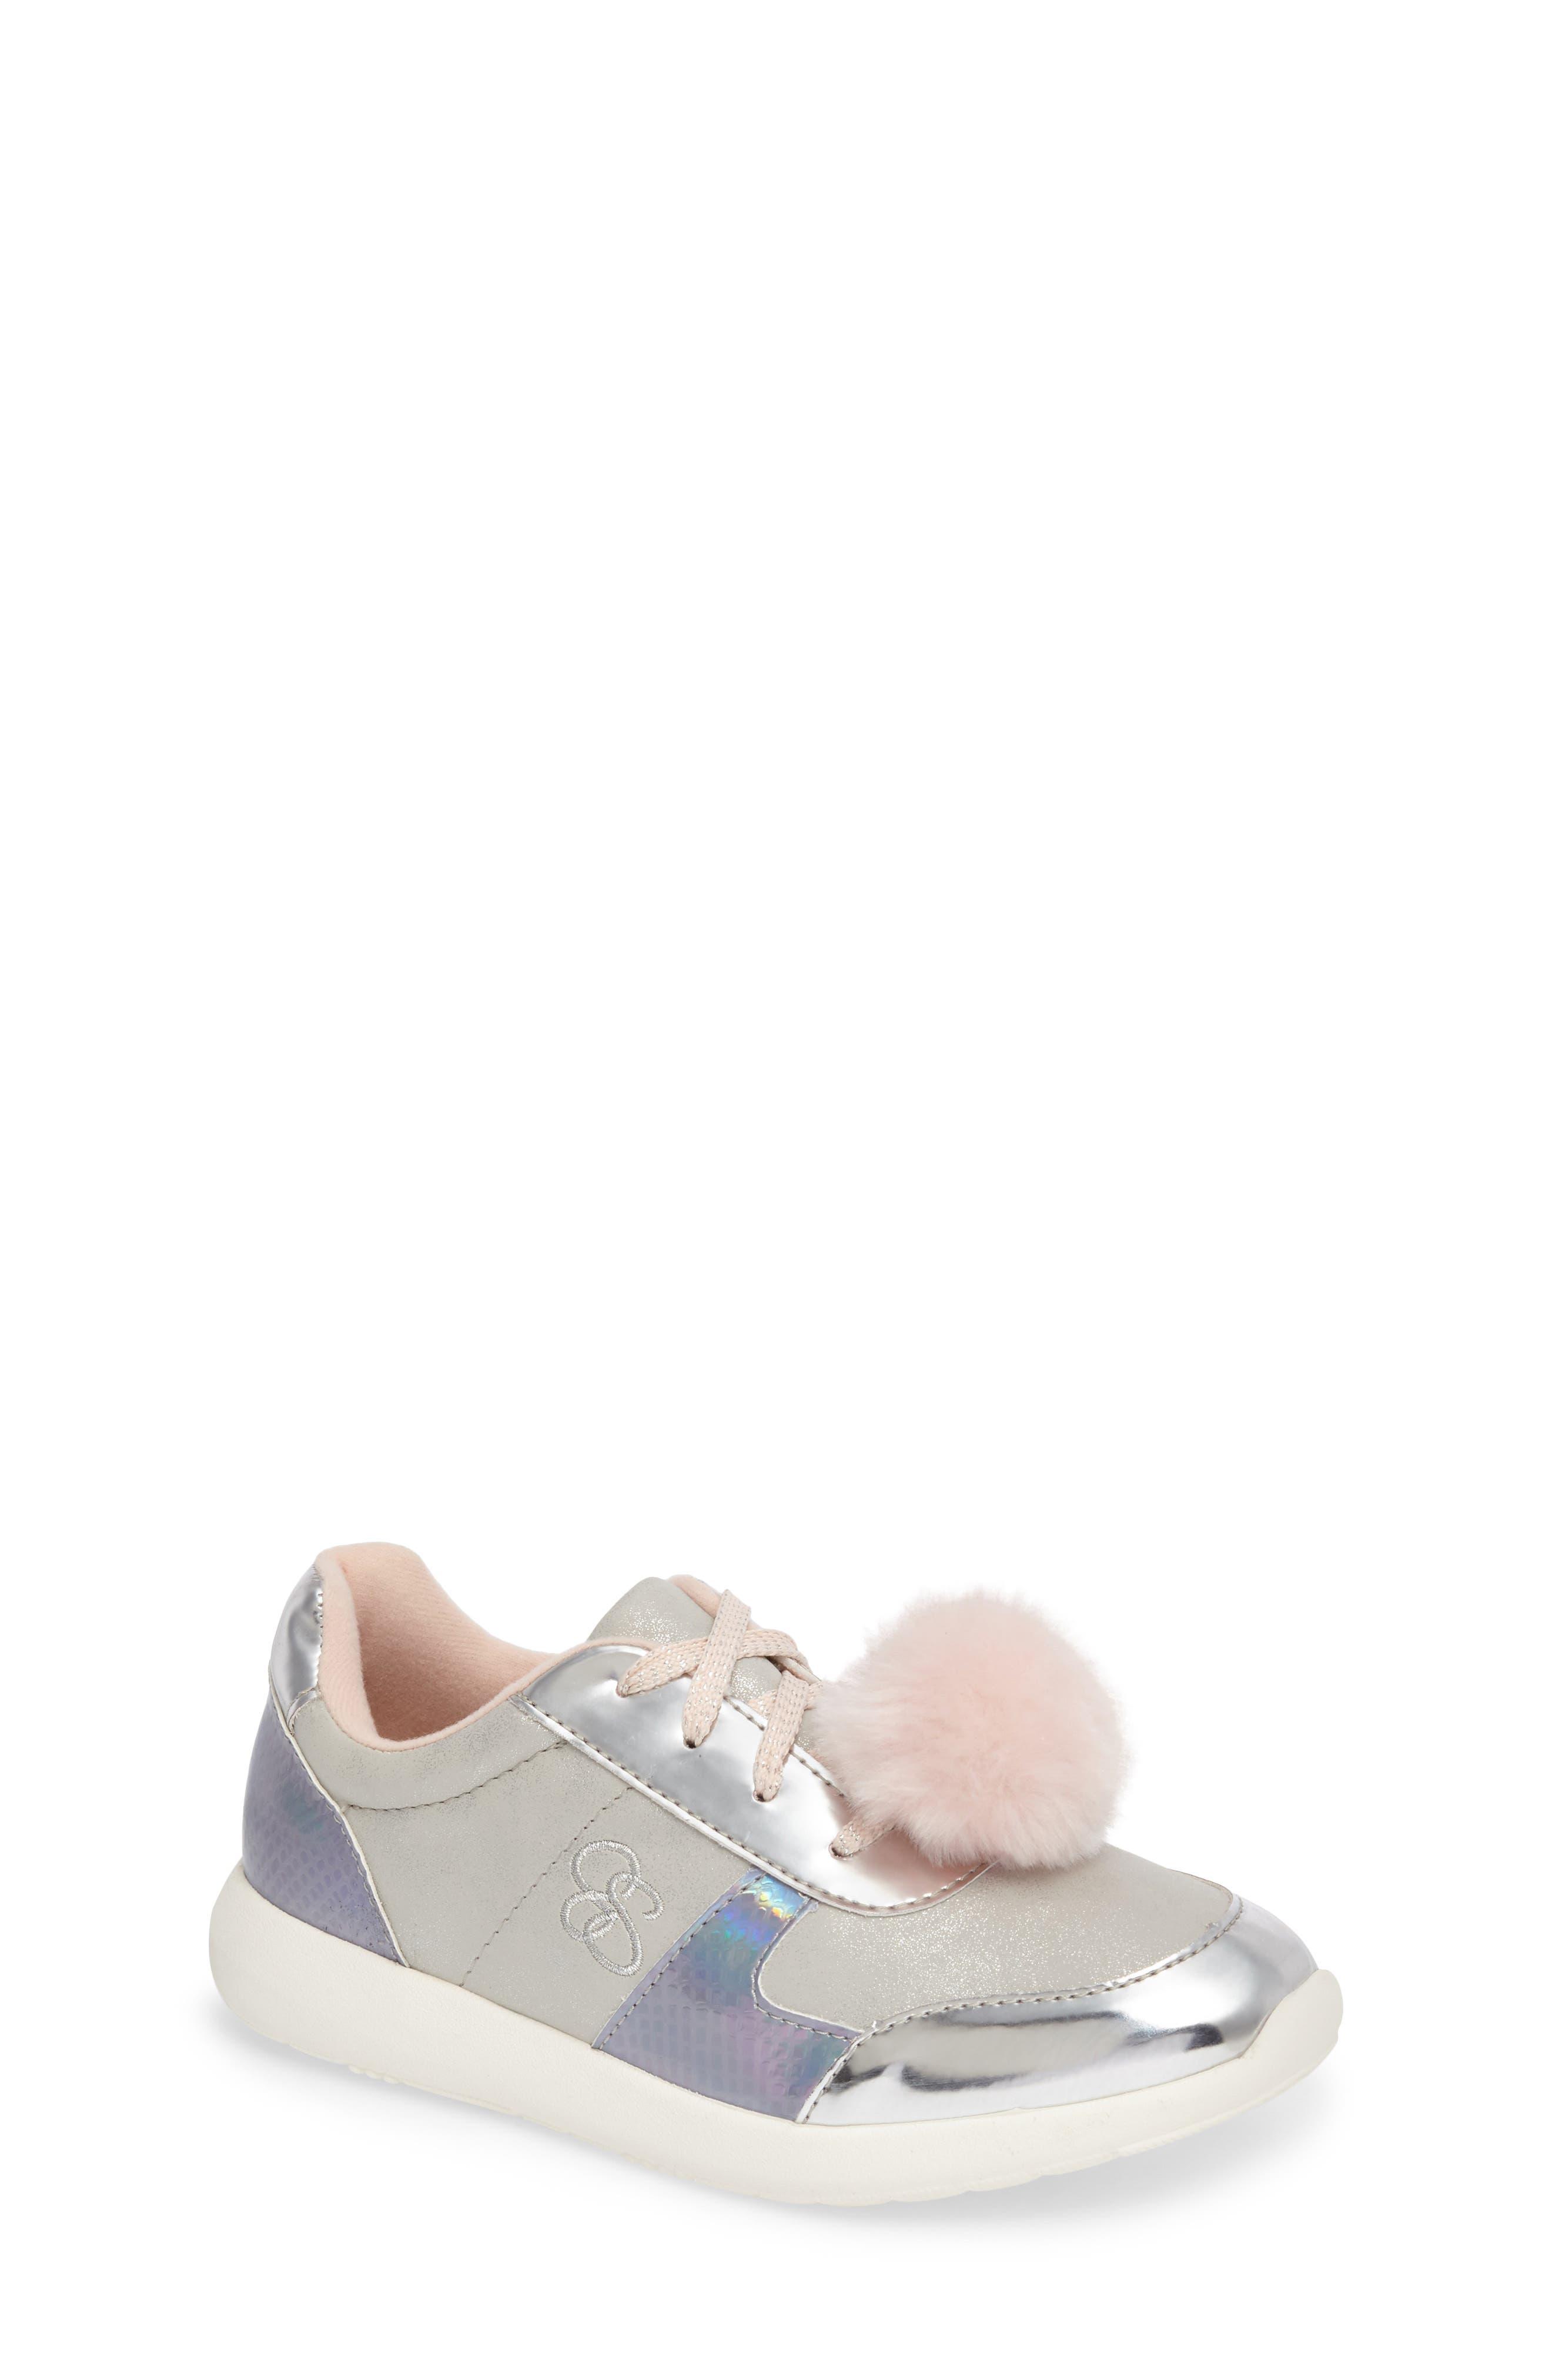 Jessica Simpson Deuce Faux Fur Pom Sneaker (Toddler, Little Kid & Big Kid)